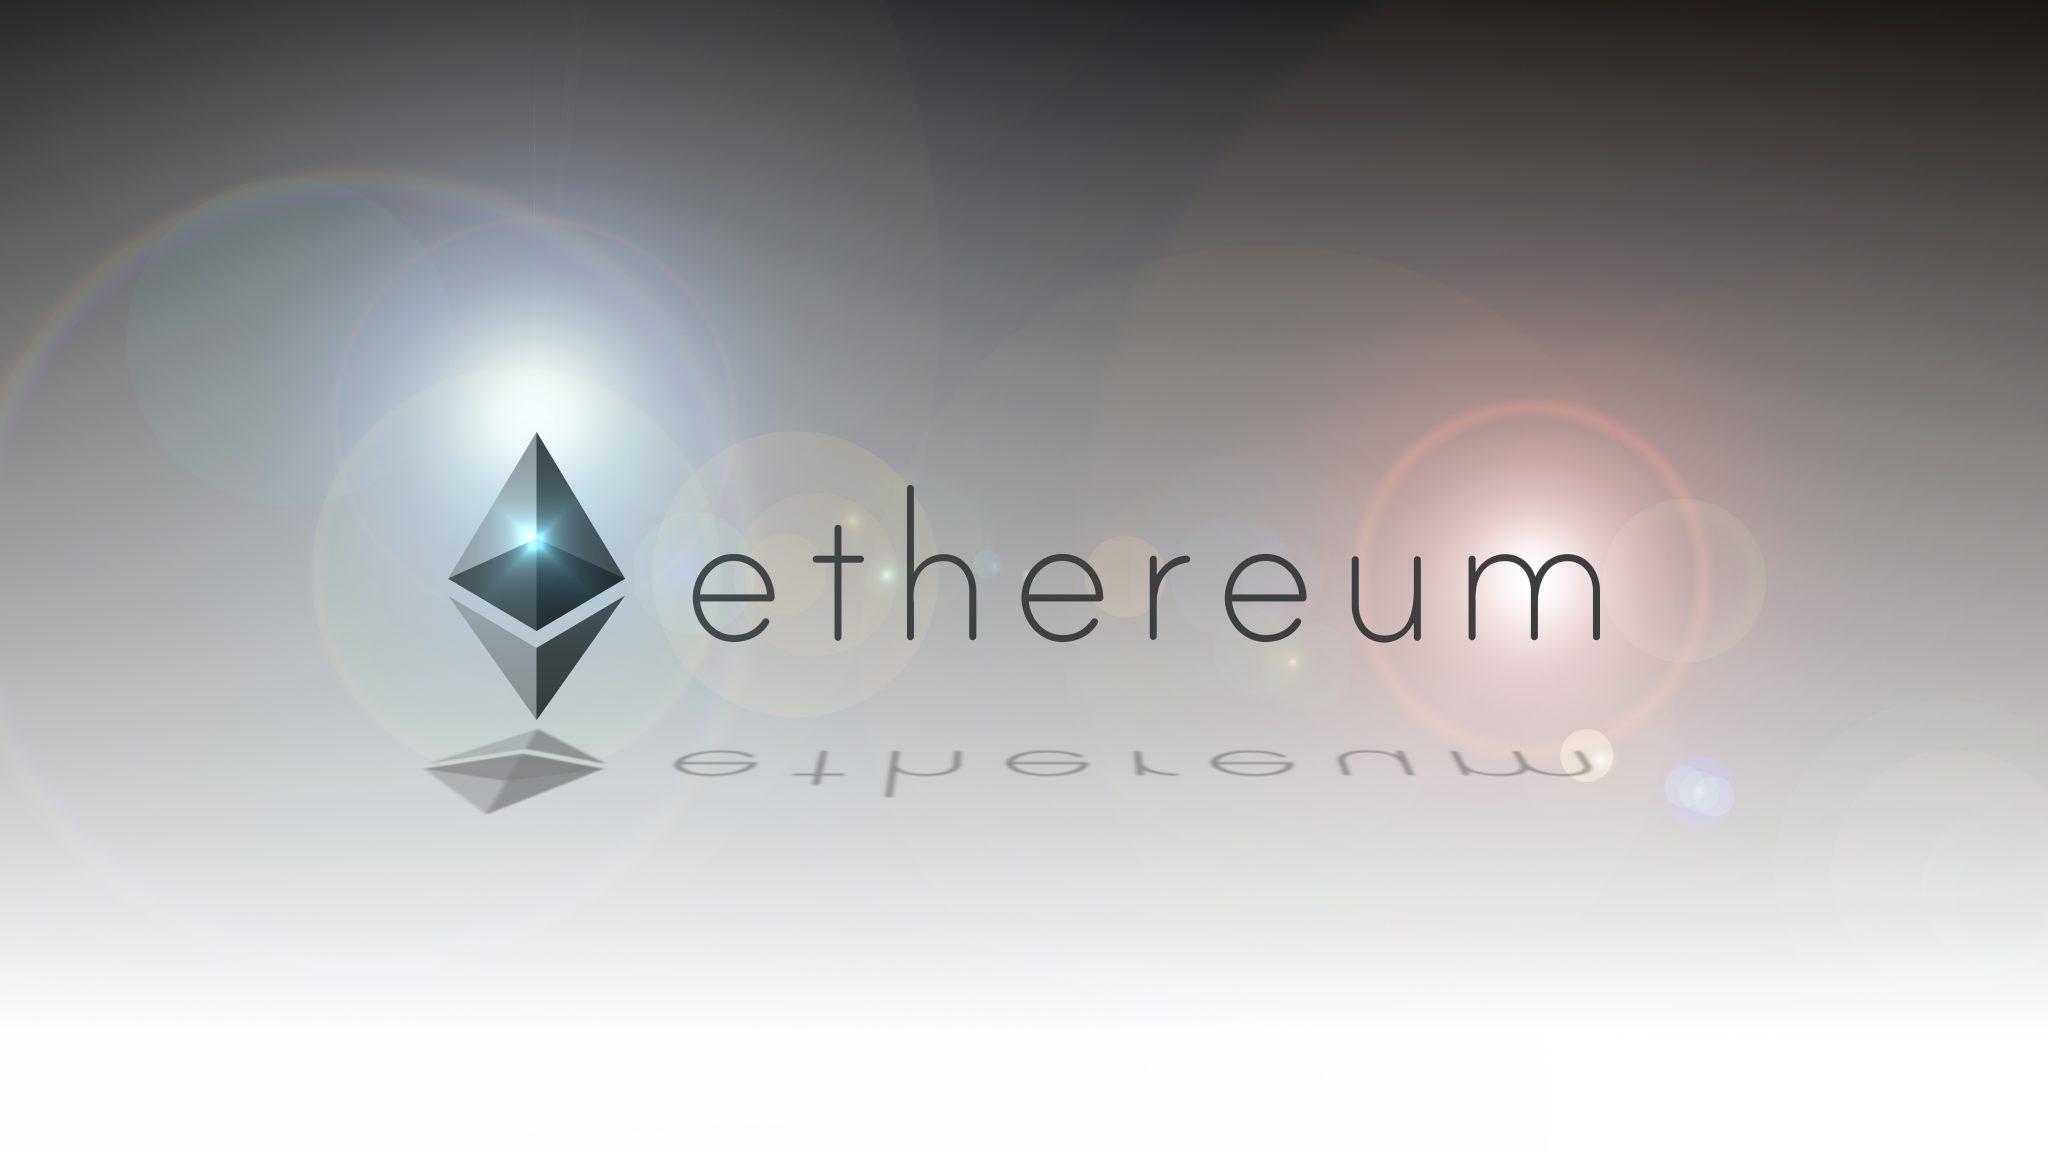 Ethereum digital crypto currency logo illustration